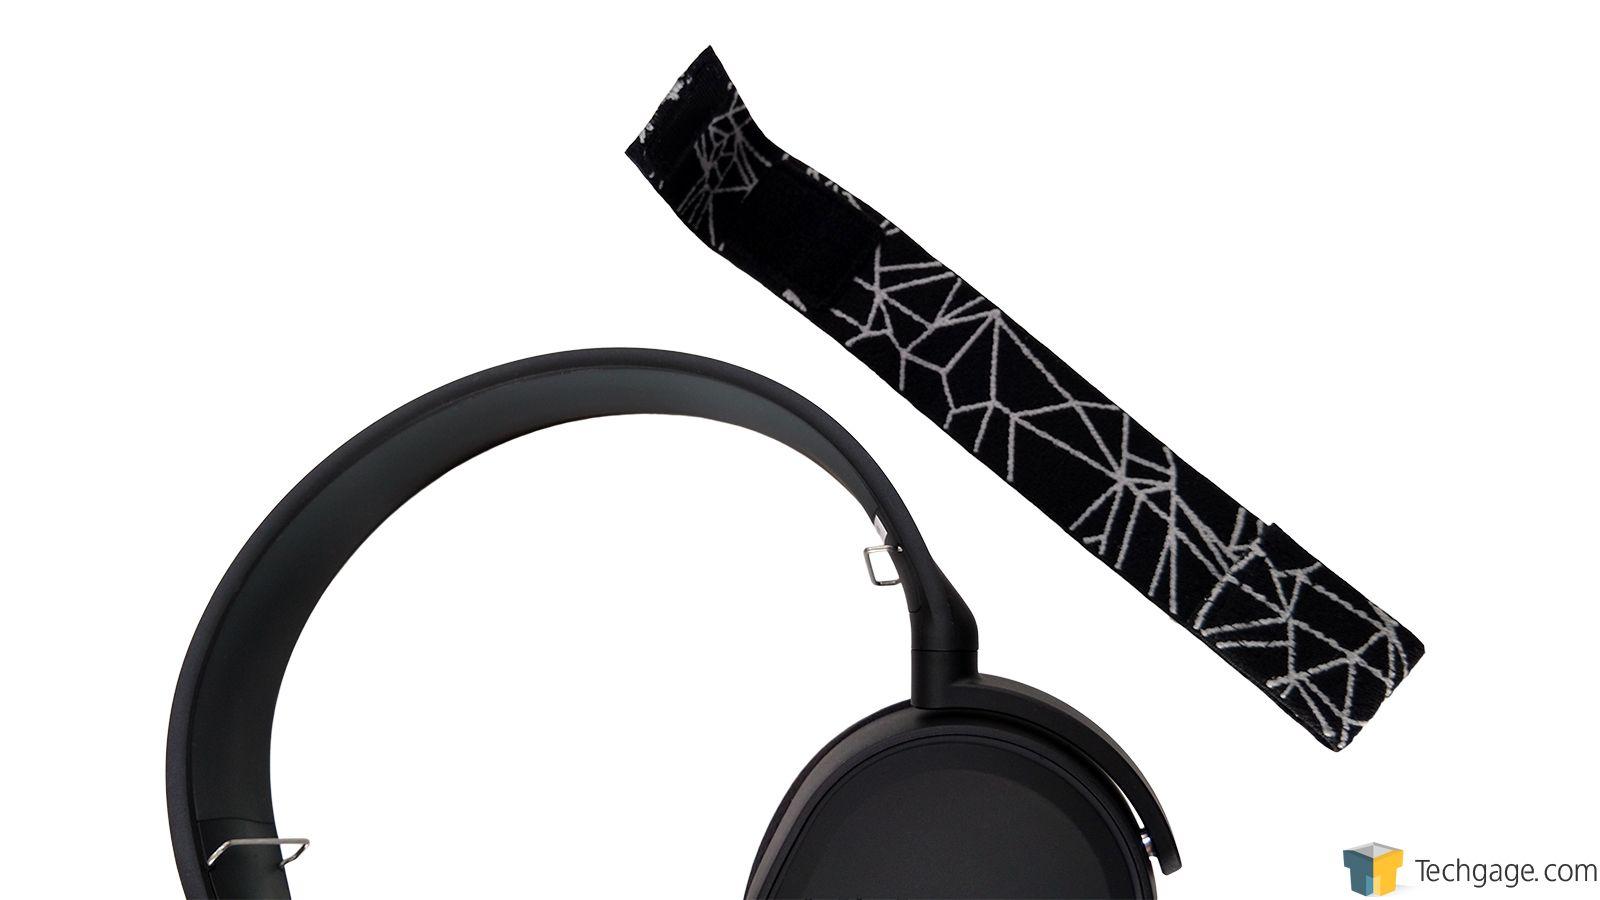 Steelseries Arctis 5 7 1 Surround Sound Rgb Headset Review